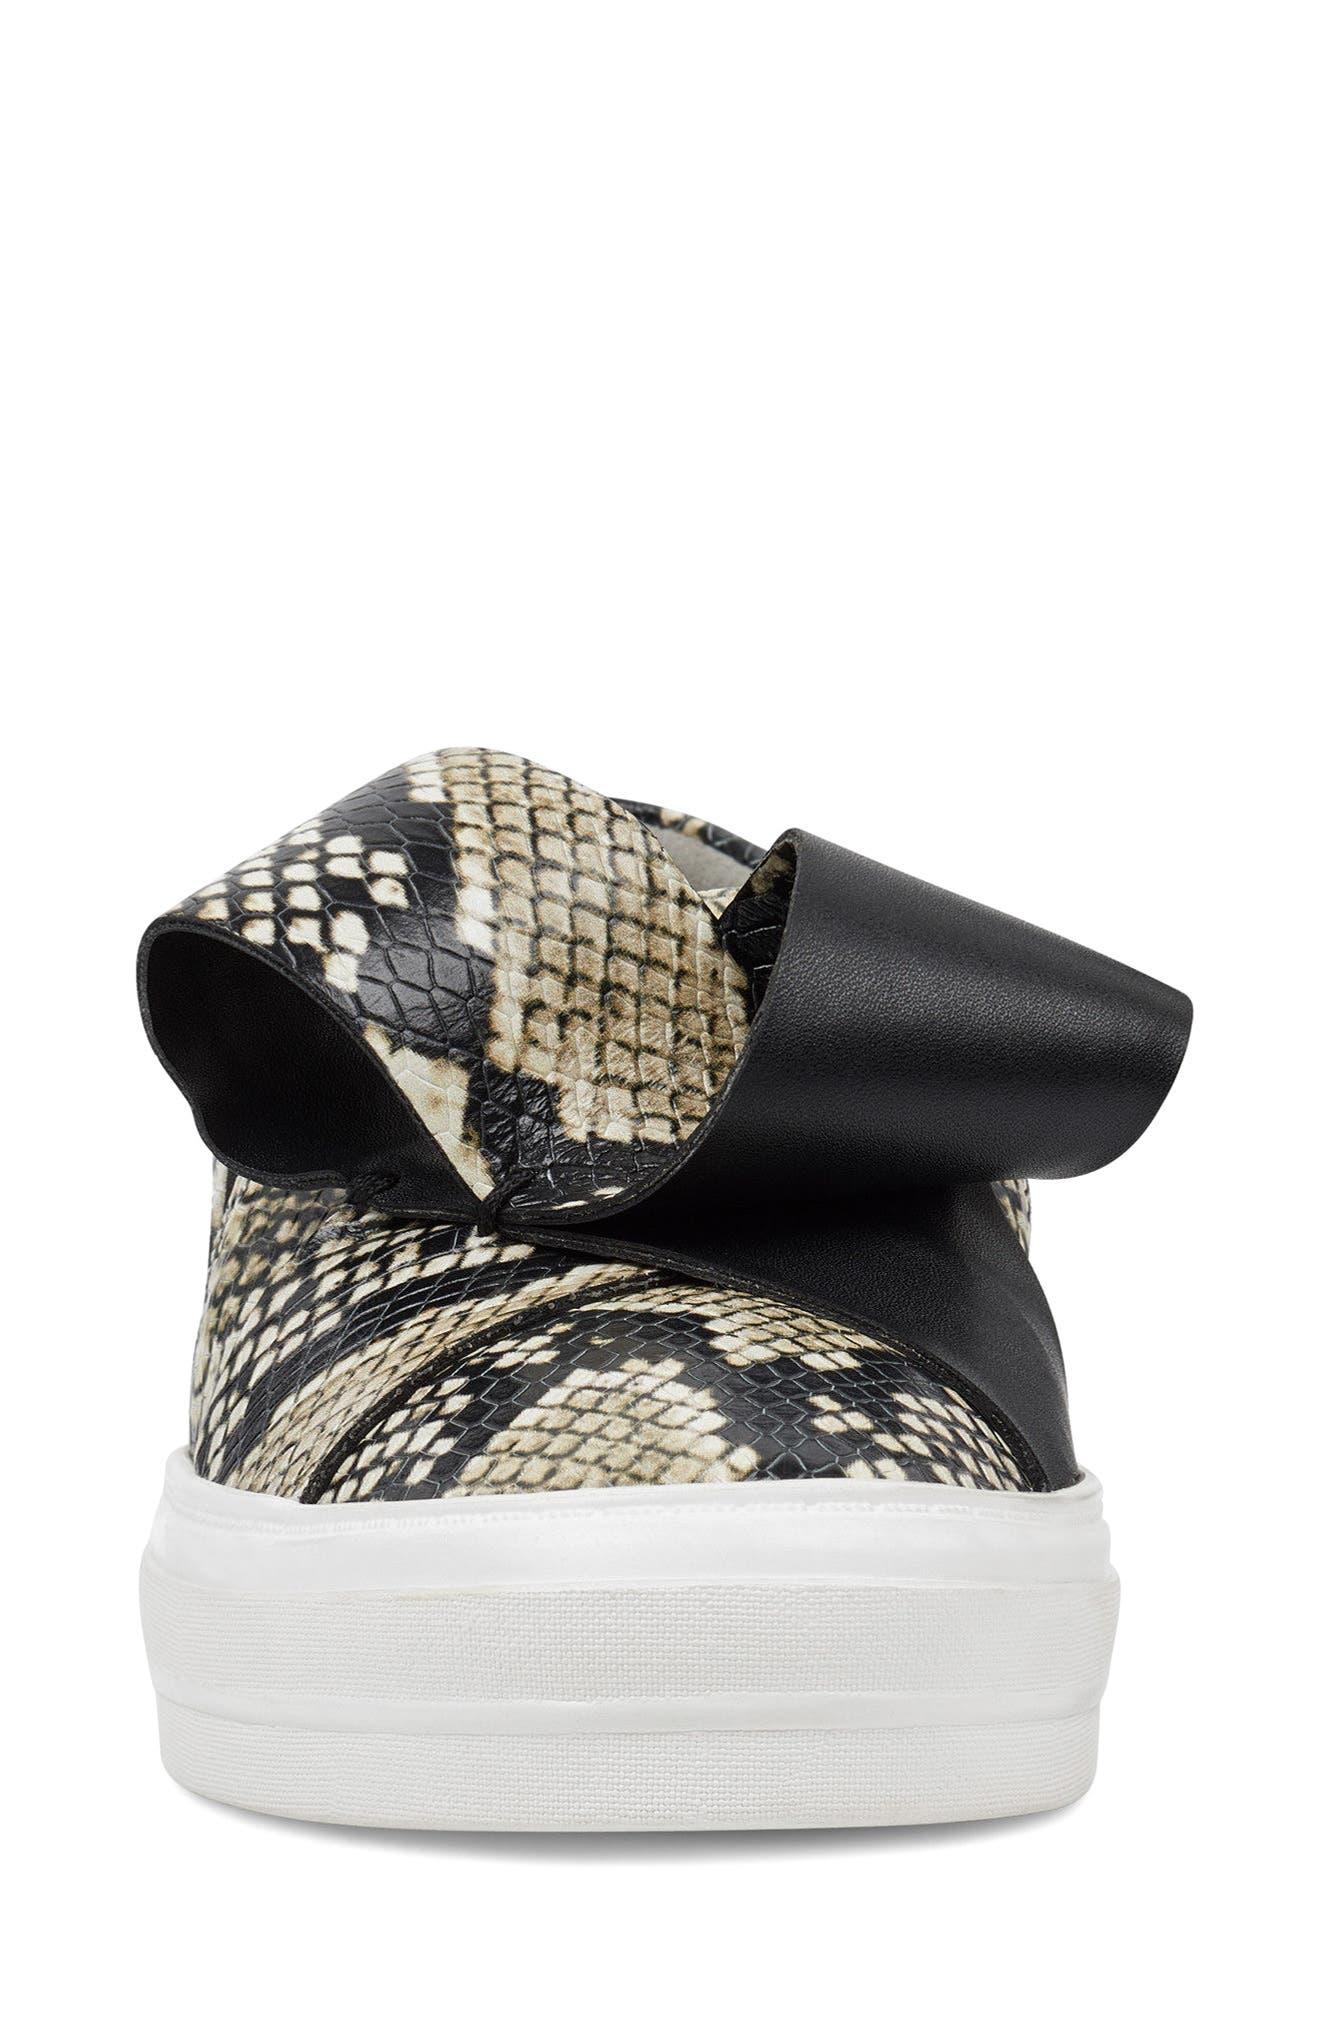 Odienella Slip-On Sneaker,                             Alternate thumbnail 4, color,                             Off White Multi Leather